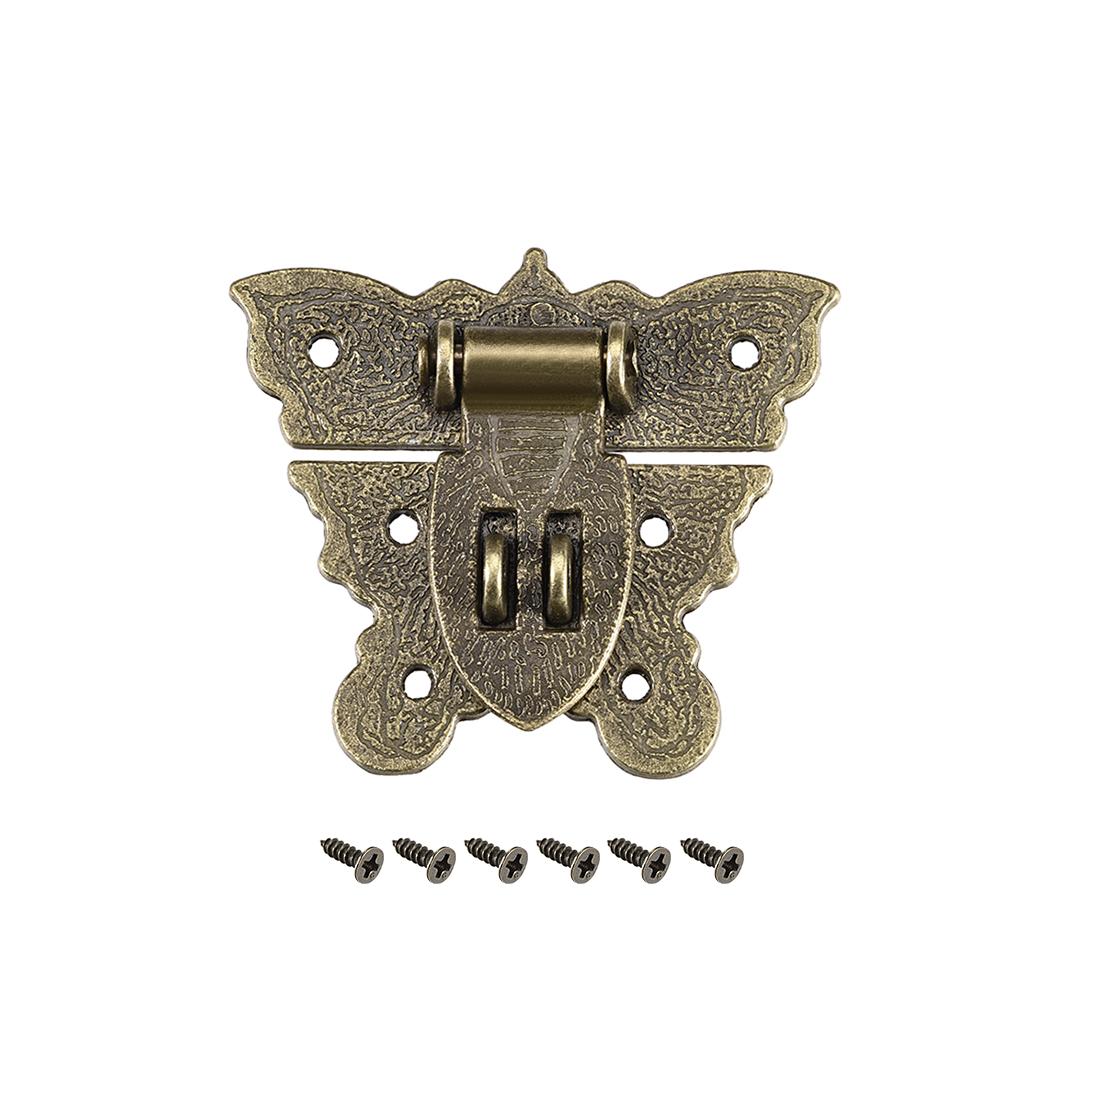 Wood Case Box Butterfly Hasp 59x52mm Zinc Alloy Antique Latches Bronze Tone